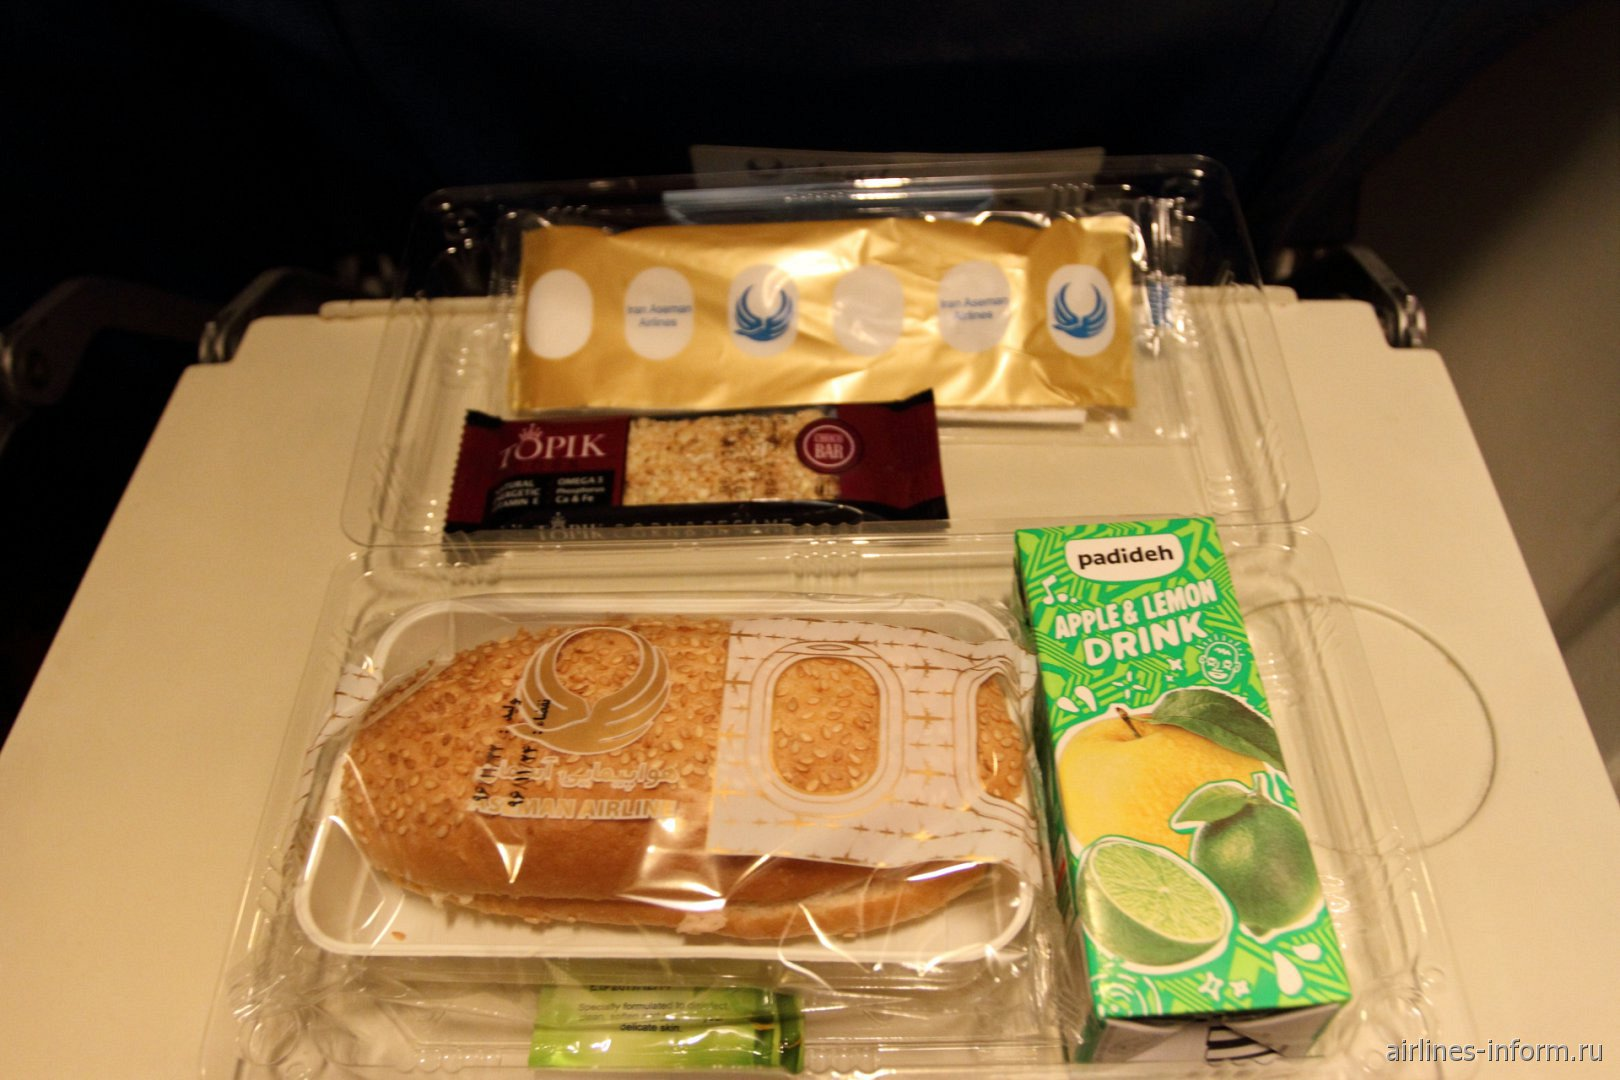 Бортпитание на рейсе Тегеран-Язд авиакомпании Iran Aseman Airlines